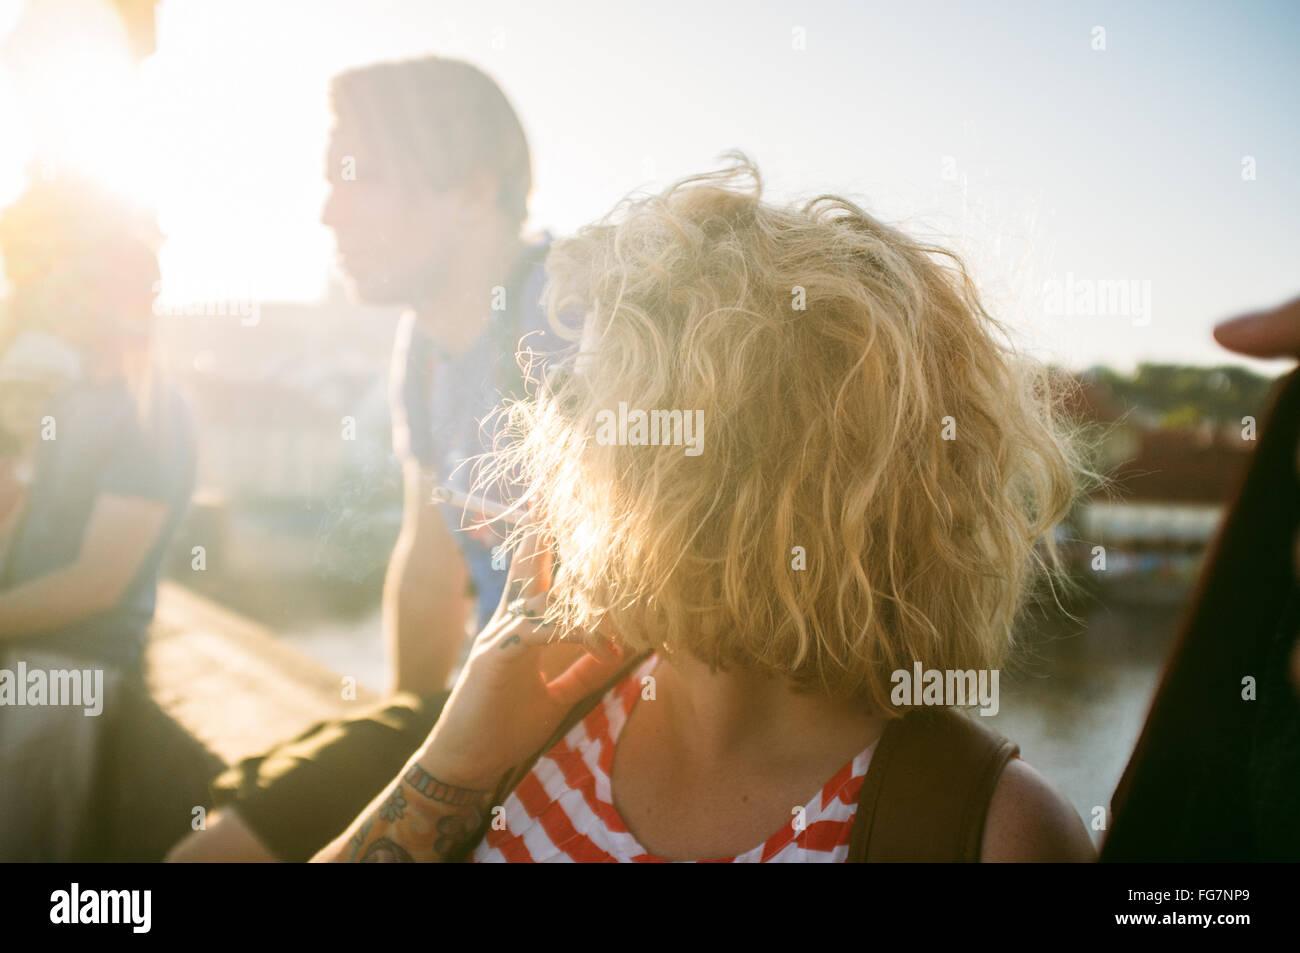 High Angle View Of Woman Smoking Cigarette On Sunny Day - Stock Image